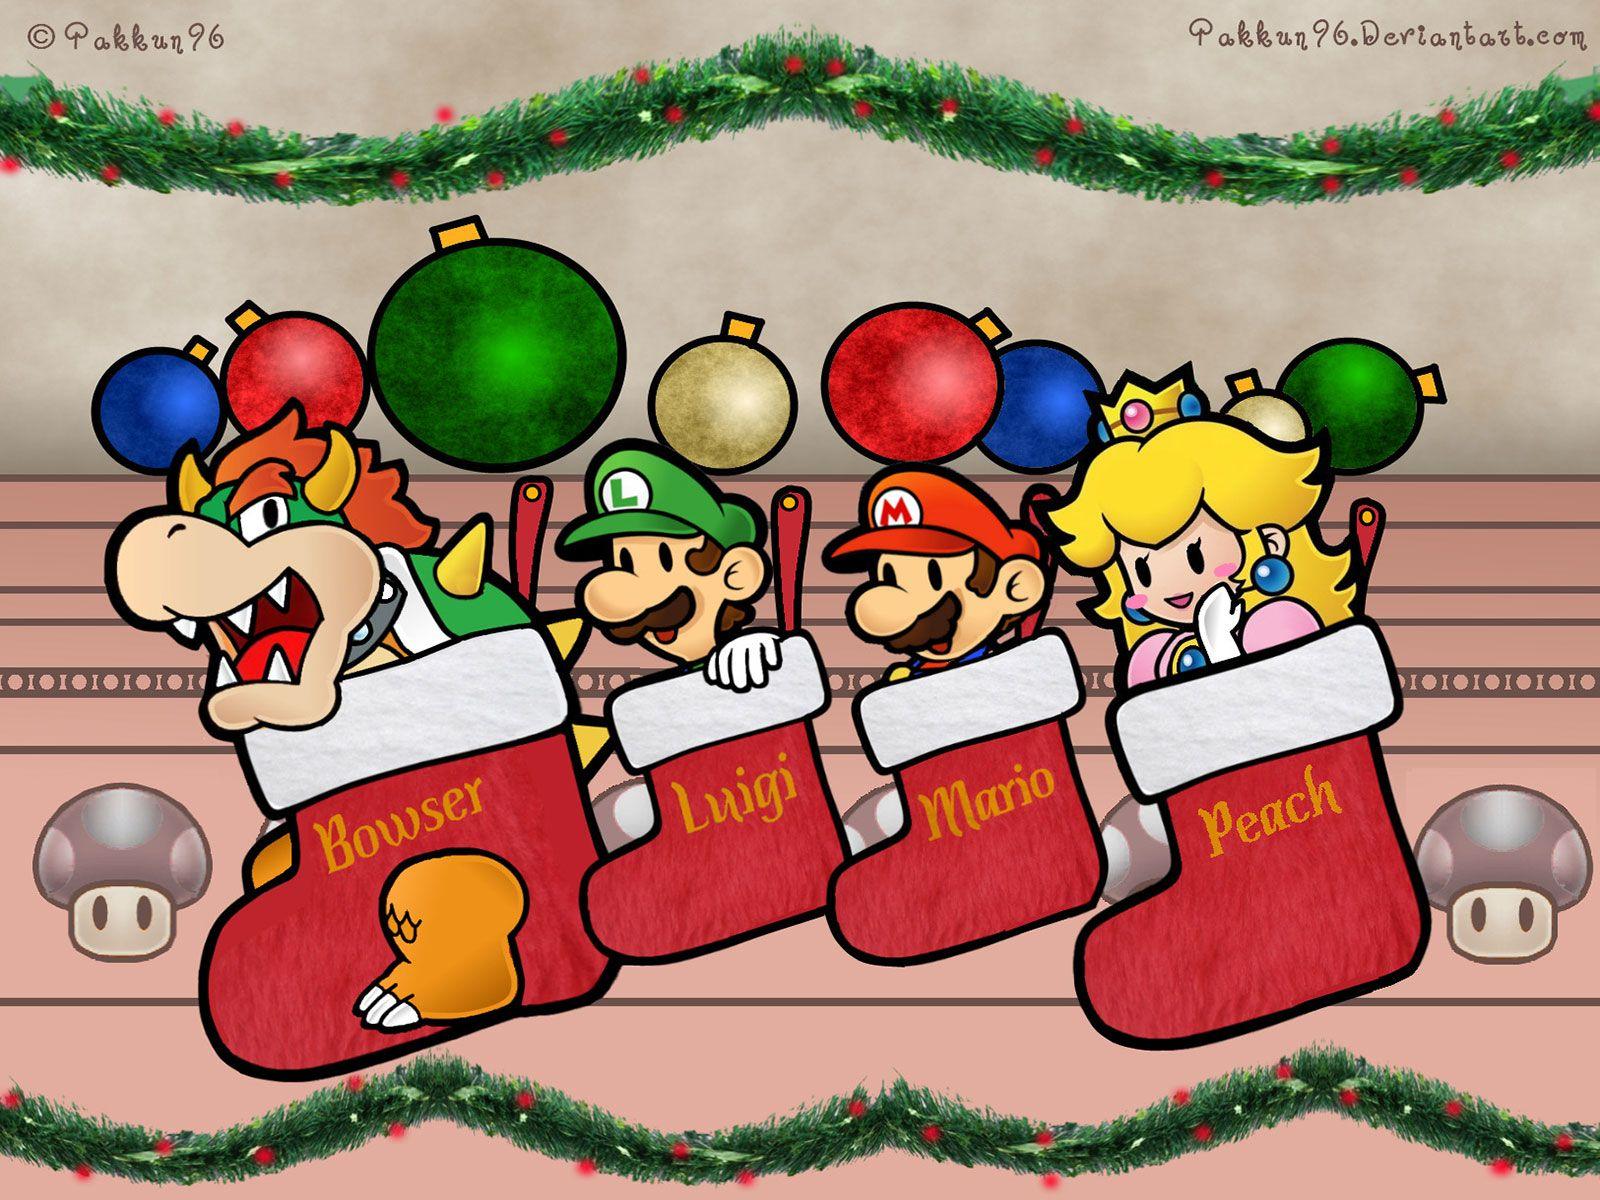 Super Mario Characters In Christmas Socks Wallpaper